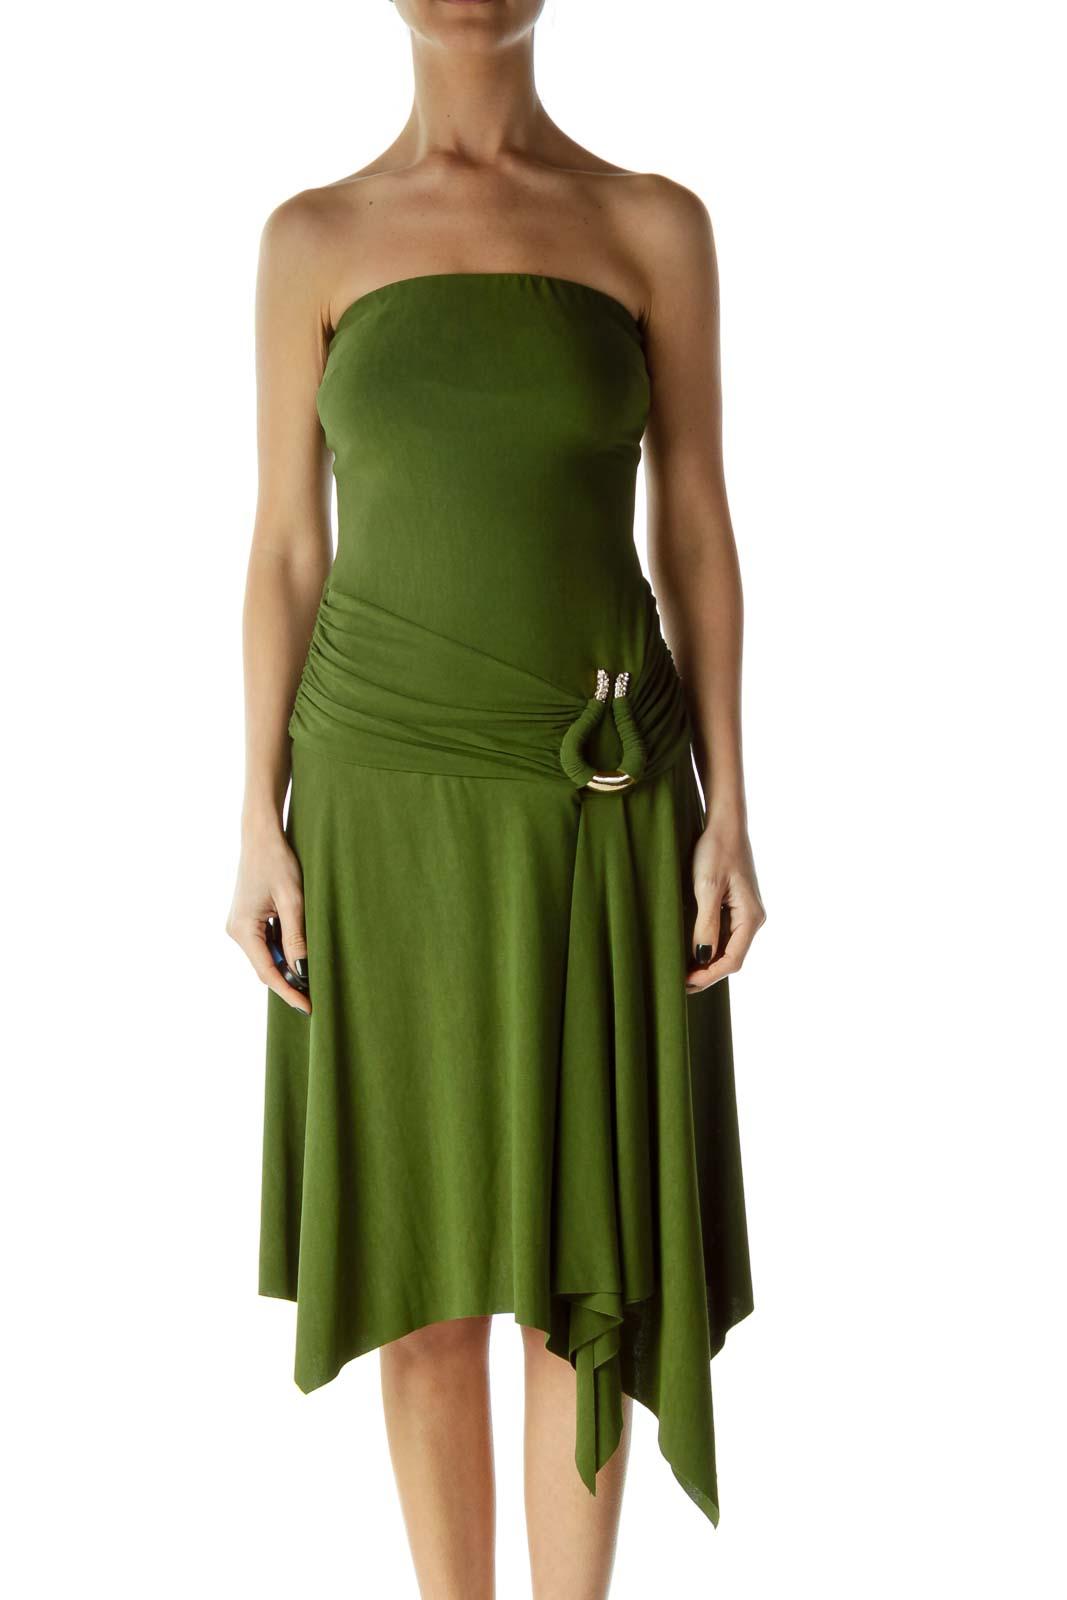 Green Strapless Rhinestone Cocktail Dress